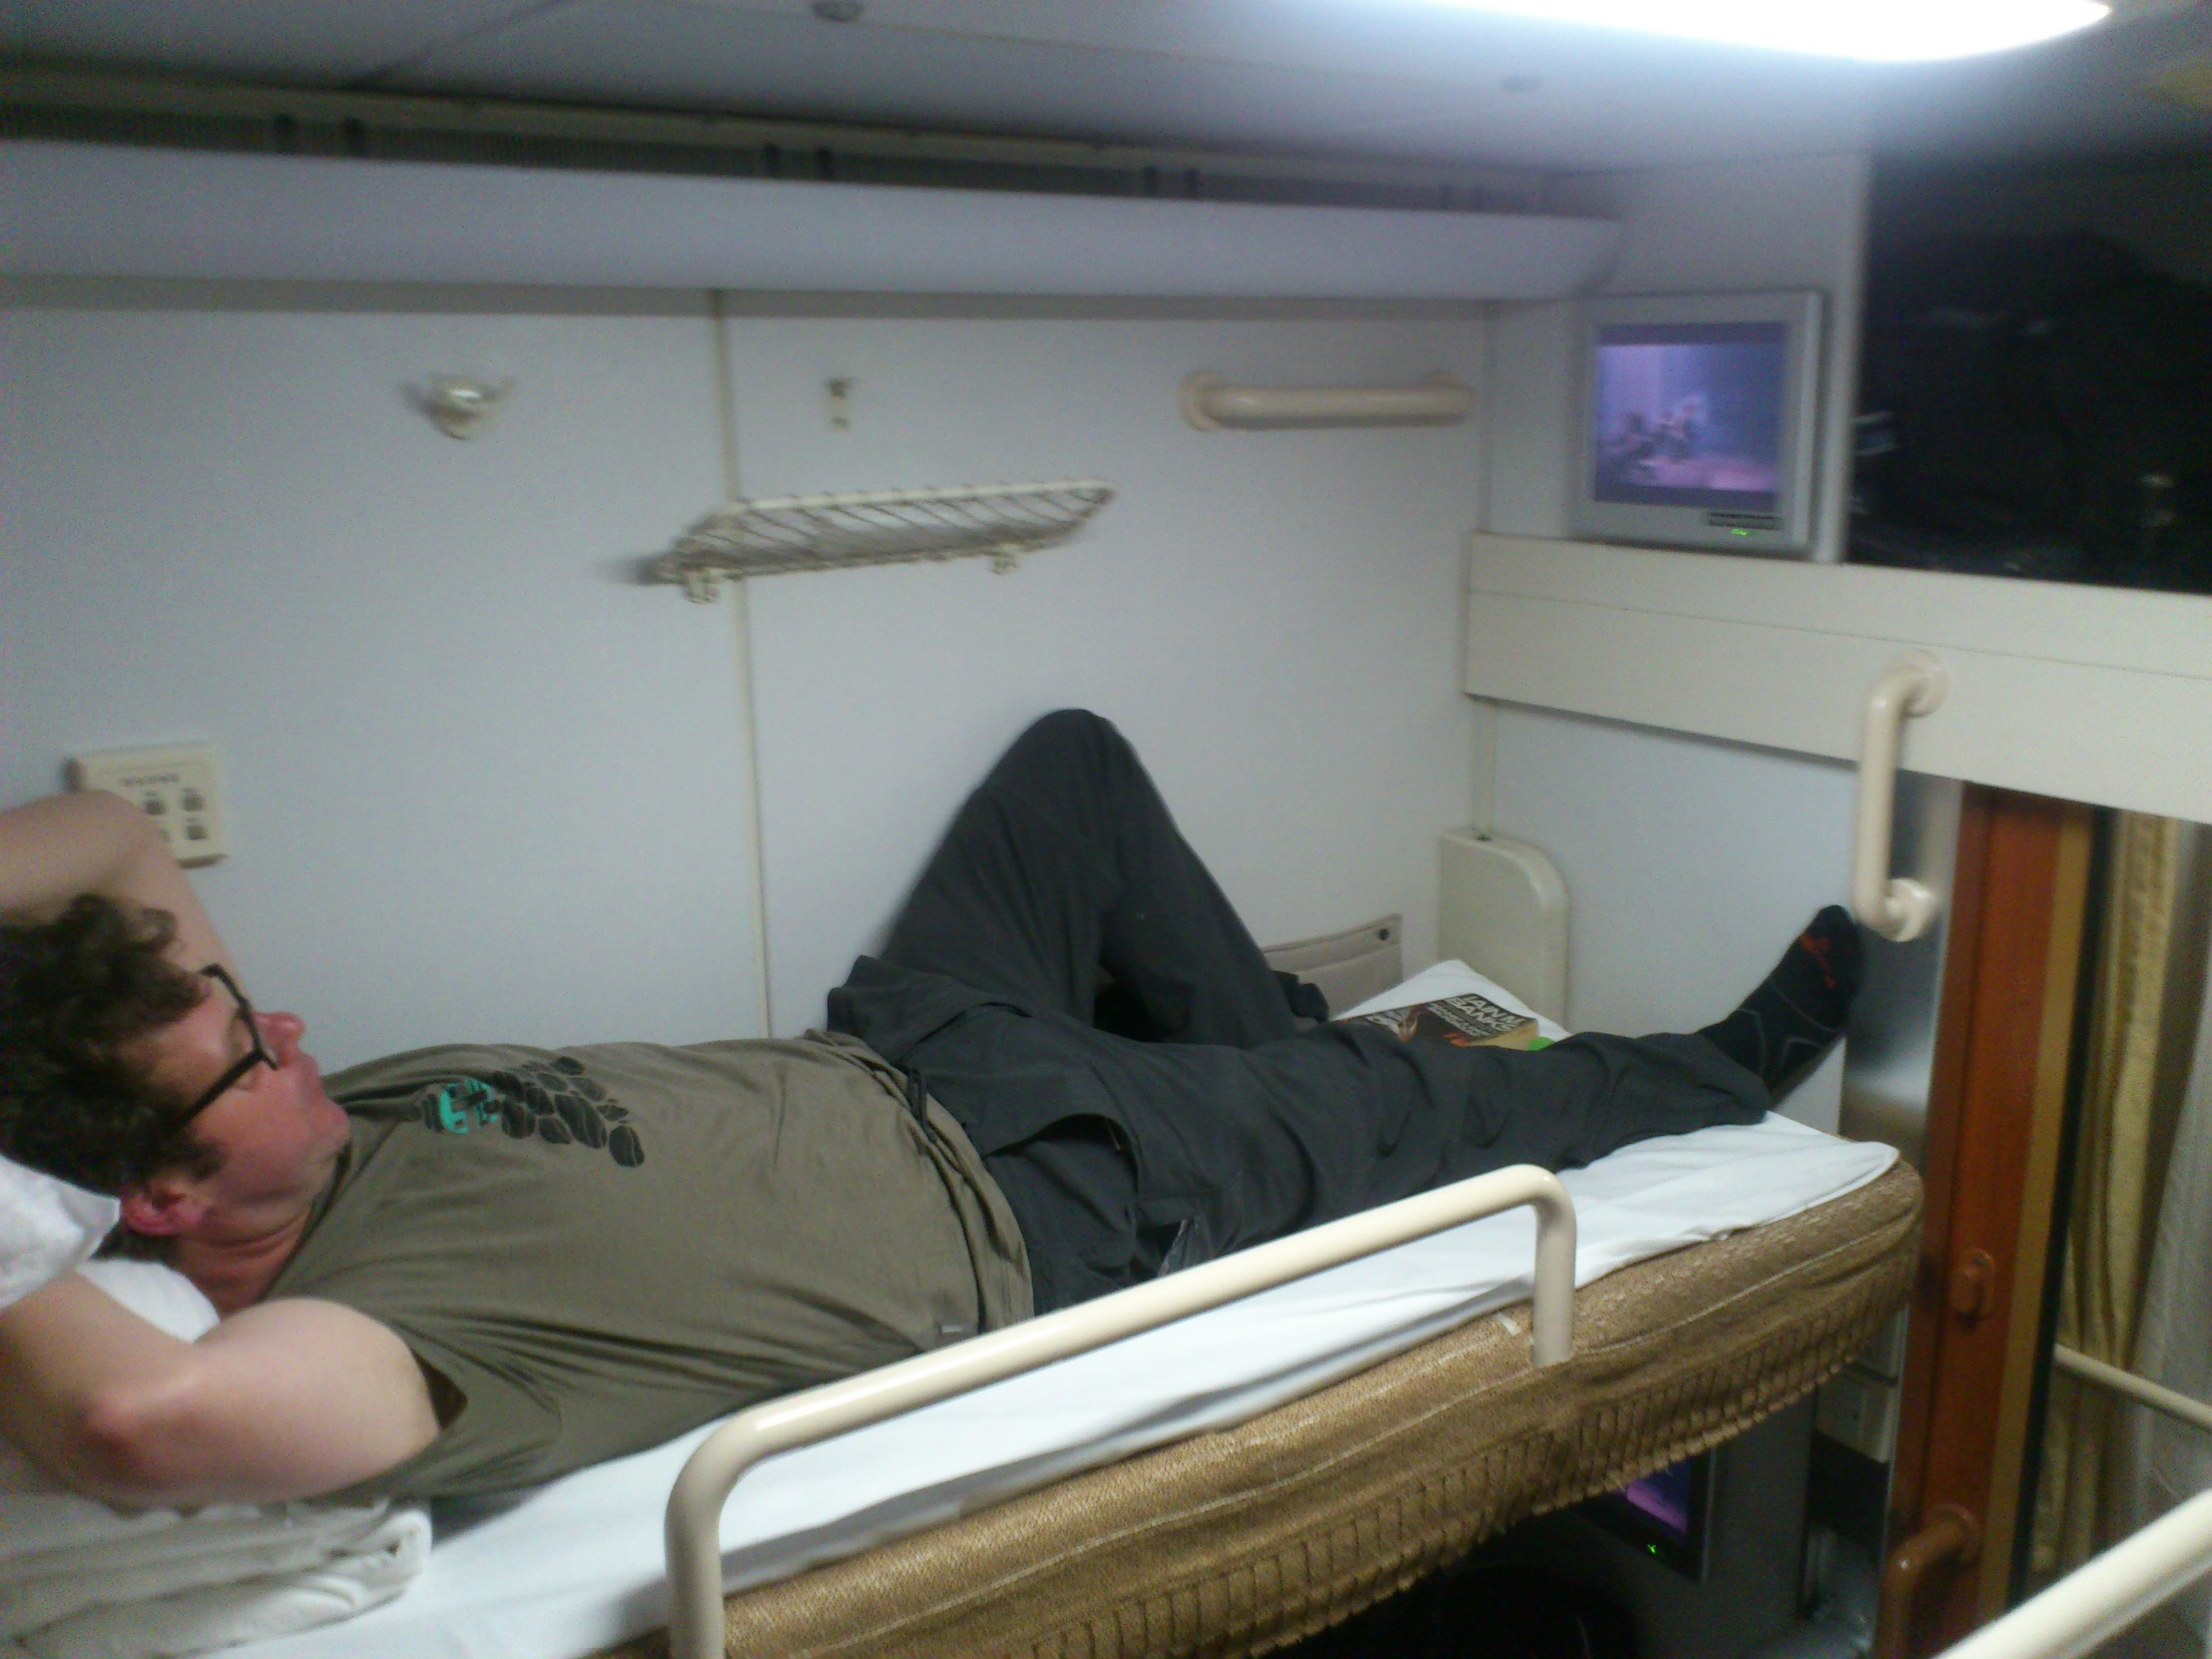 Soft Sleeper on the T99 Shanghai to Kowloon train